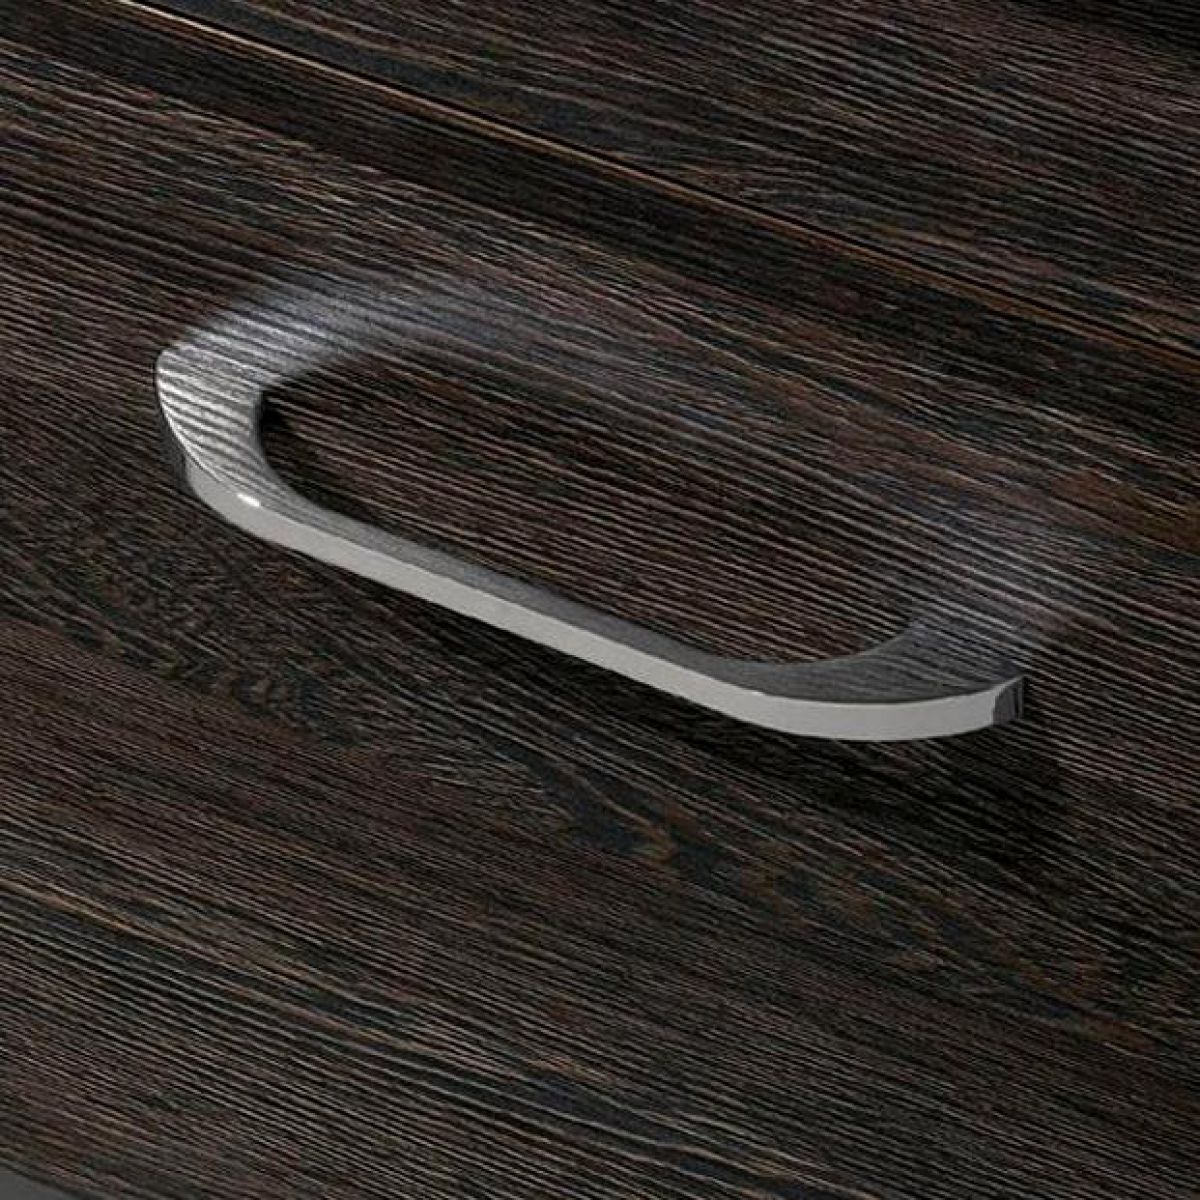 bauhaus handle options uk bathrooms. Black Bedroom Furniture Sets. Home Design Ideas